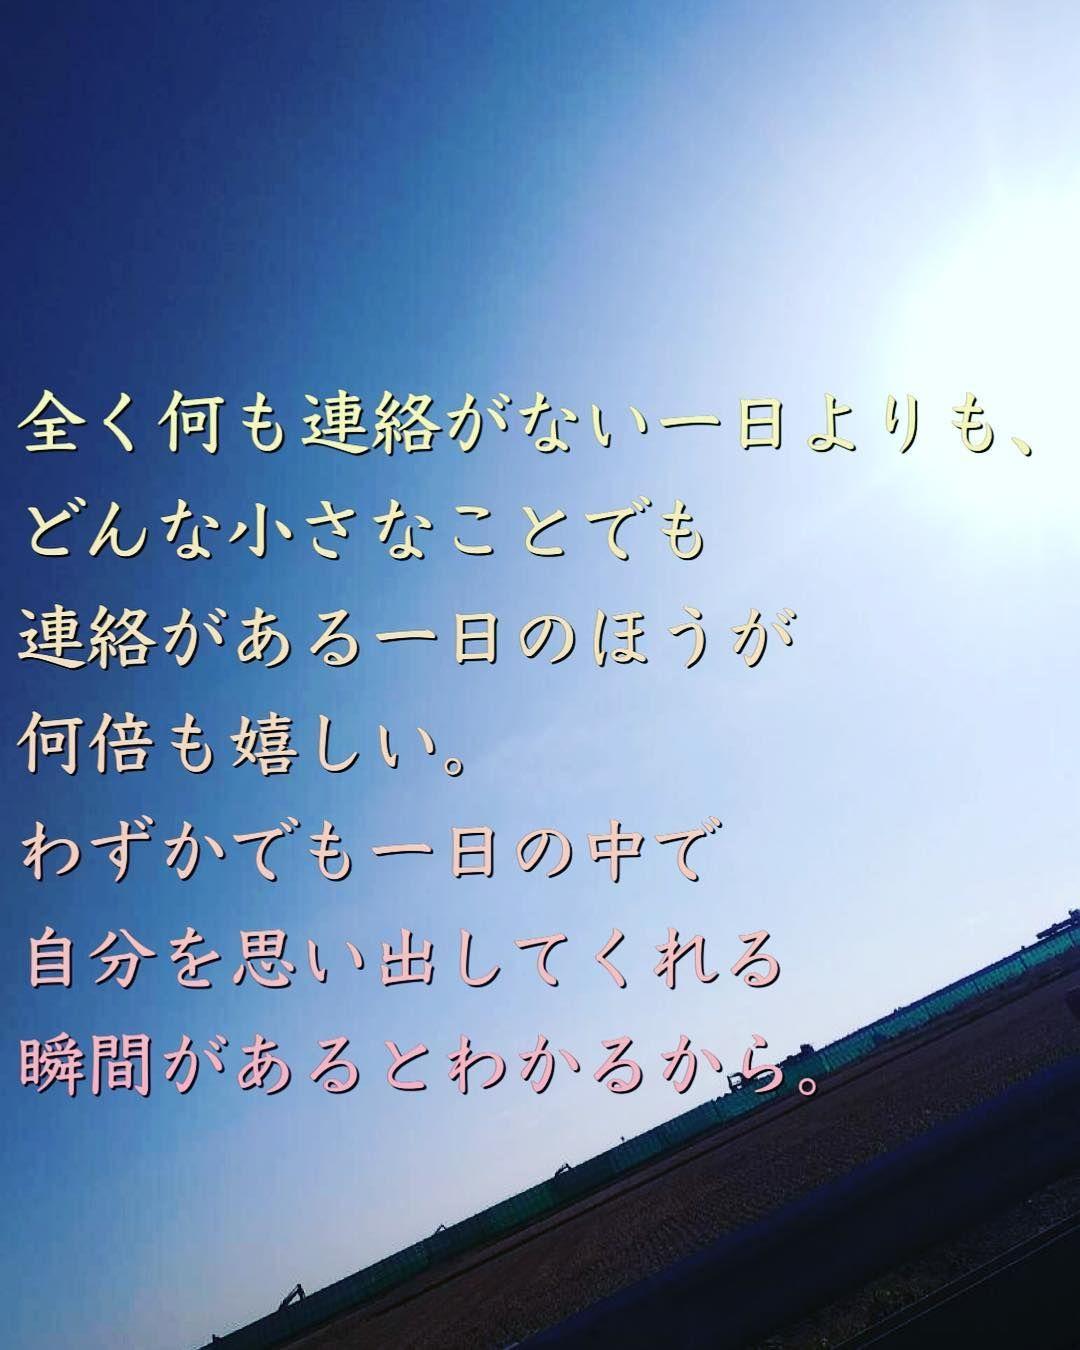 "Photo of Nana on Instagram: ""、 カフカさんの言葉 、 #心に残る言葉#心に響く言葉#言葉の力#言葉#言霊#気…"